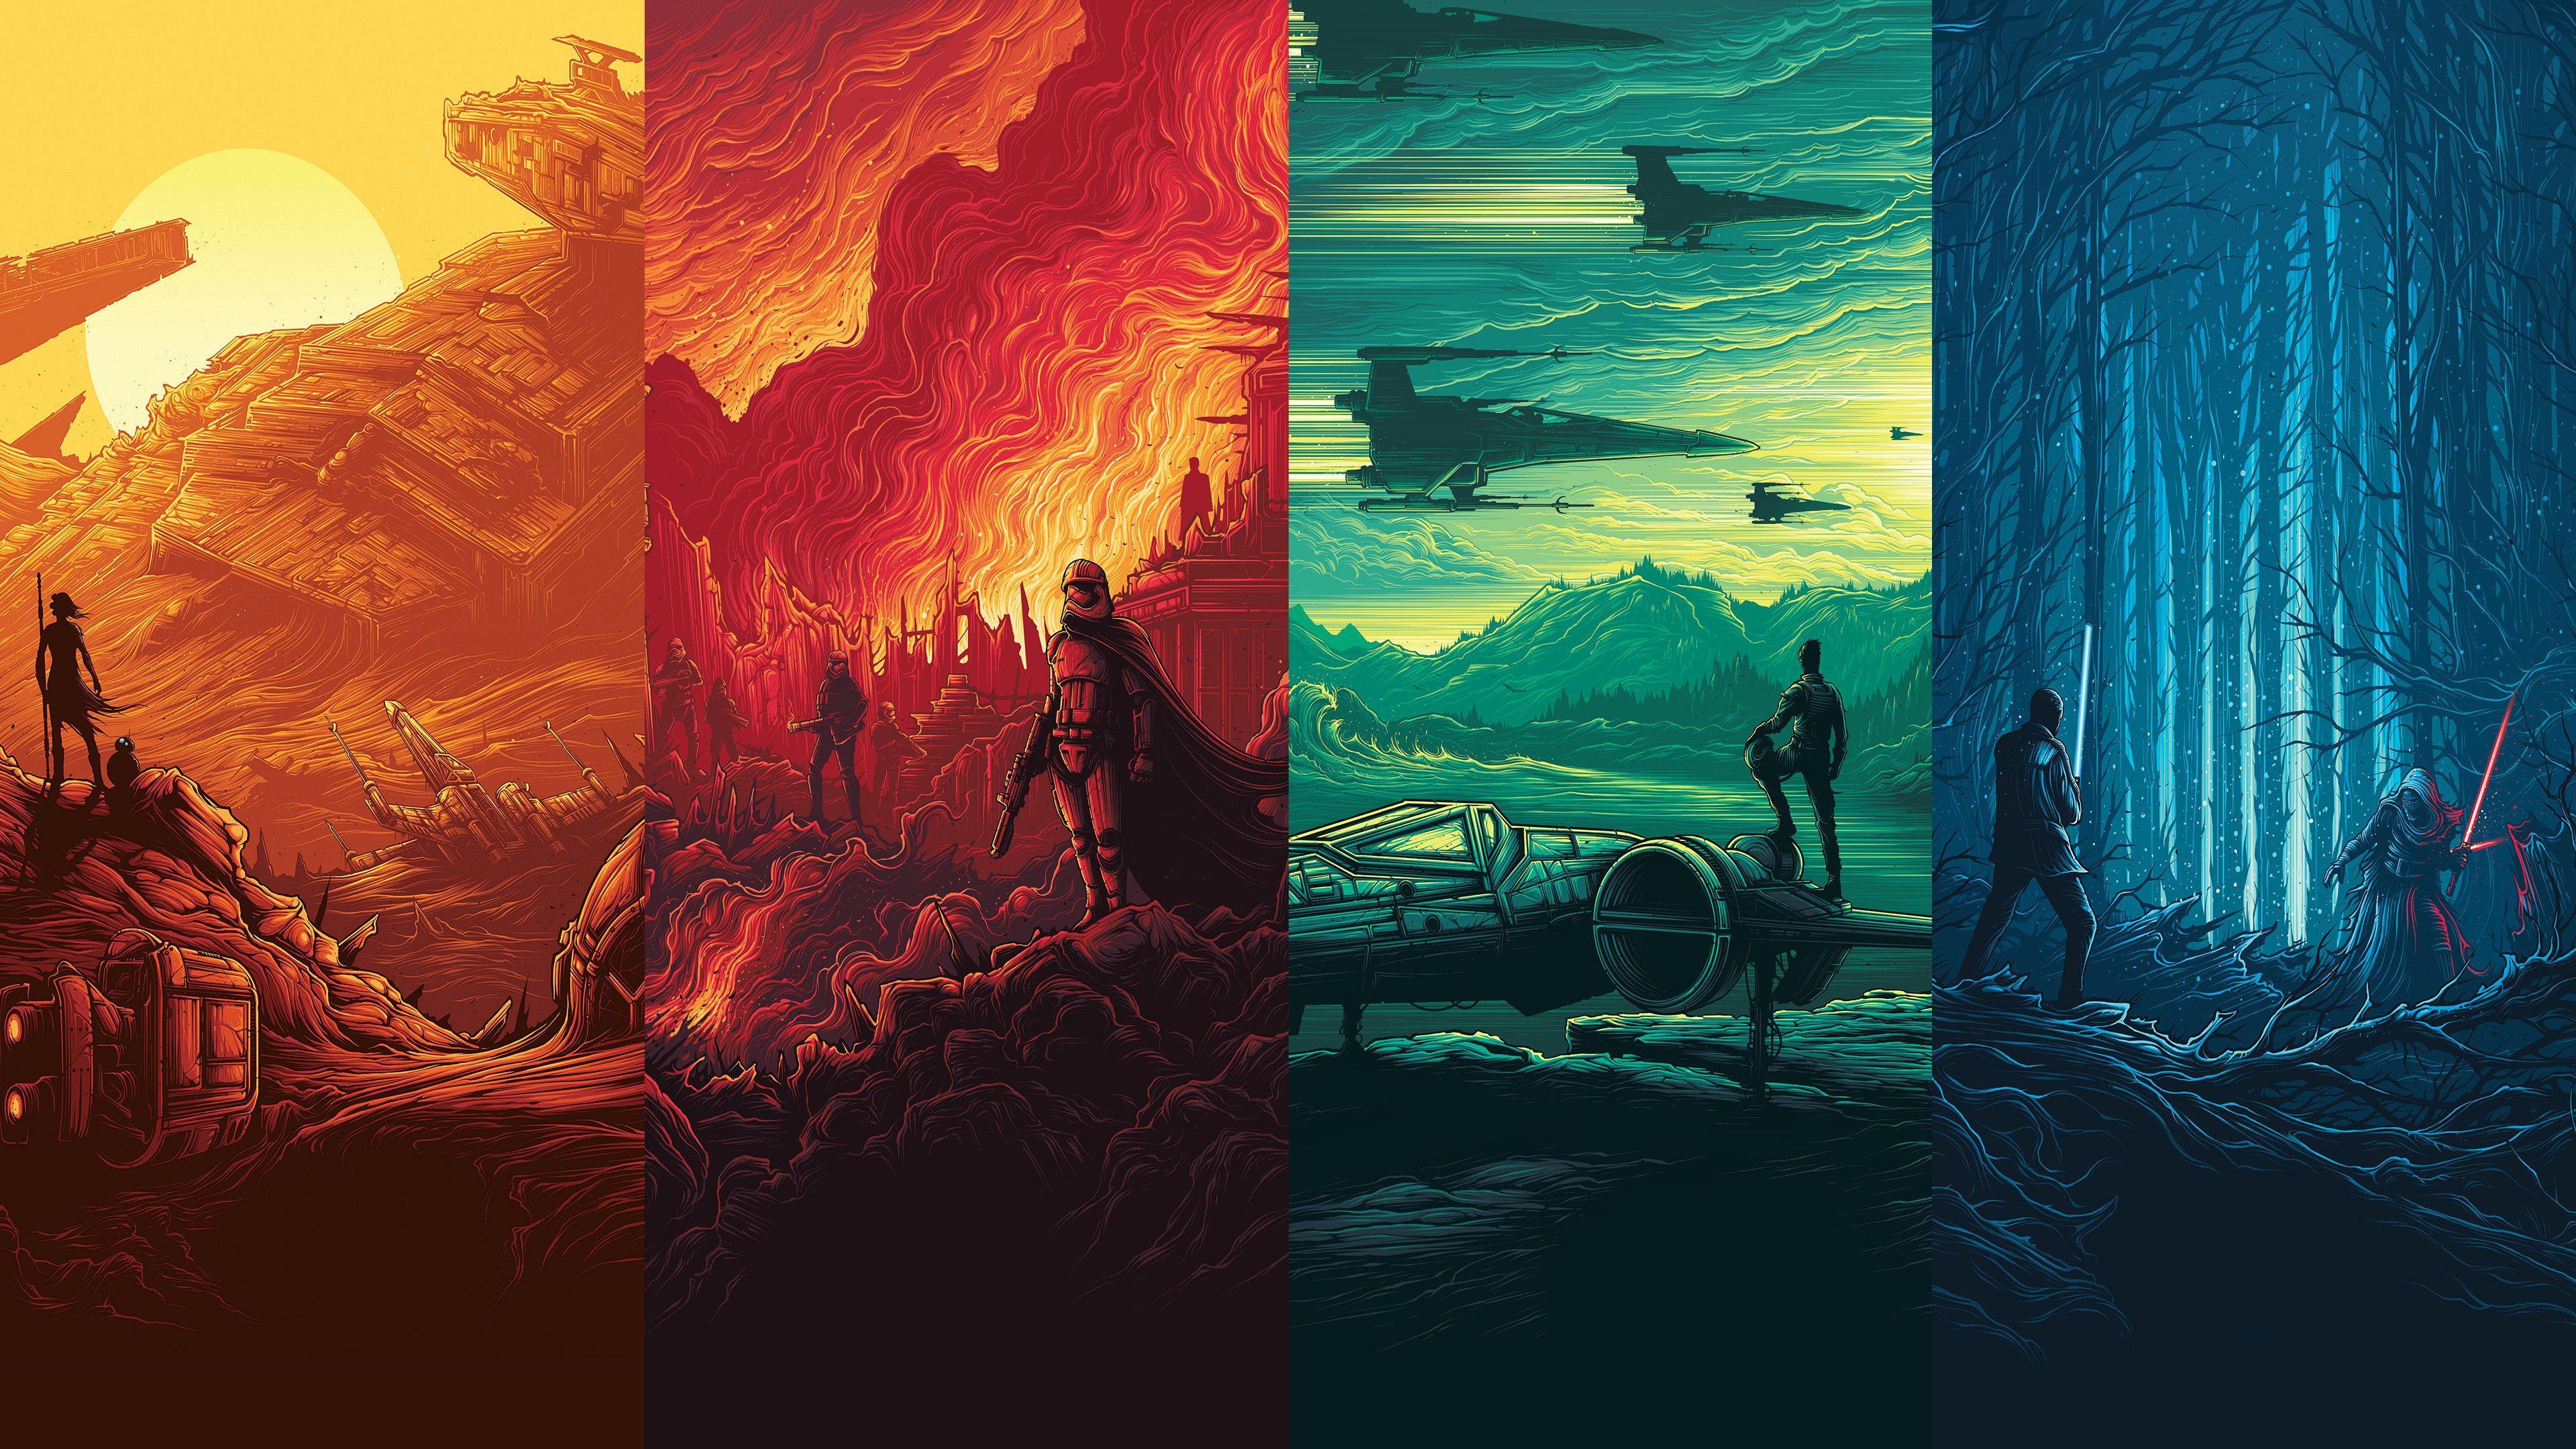 Star Wars Desktop Wallpapers Top Free Star Wars Desktop Backgrounds Wallpaperaccess